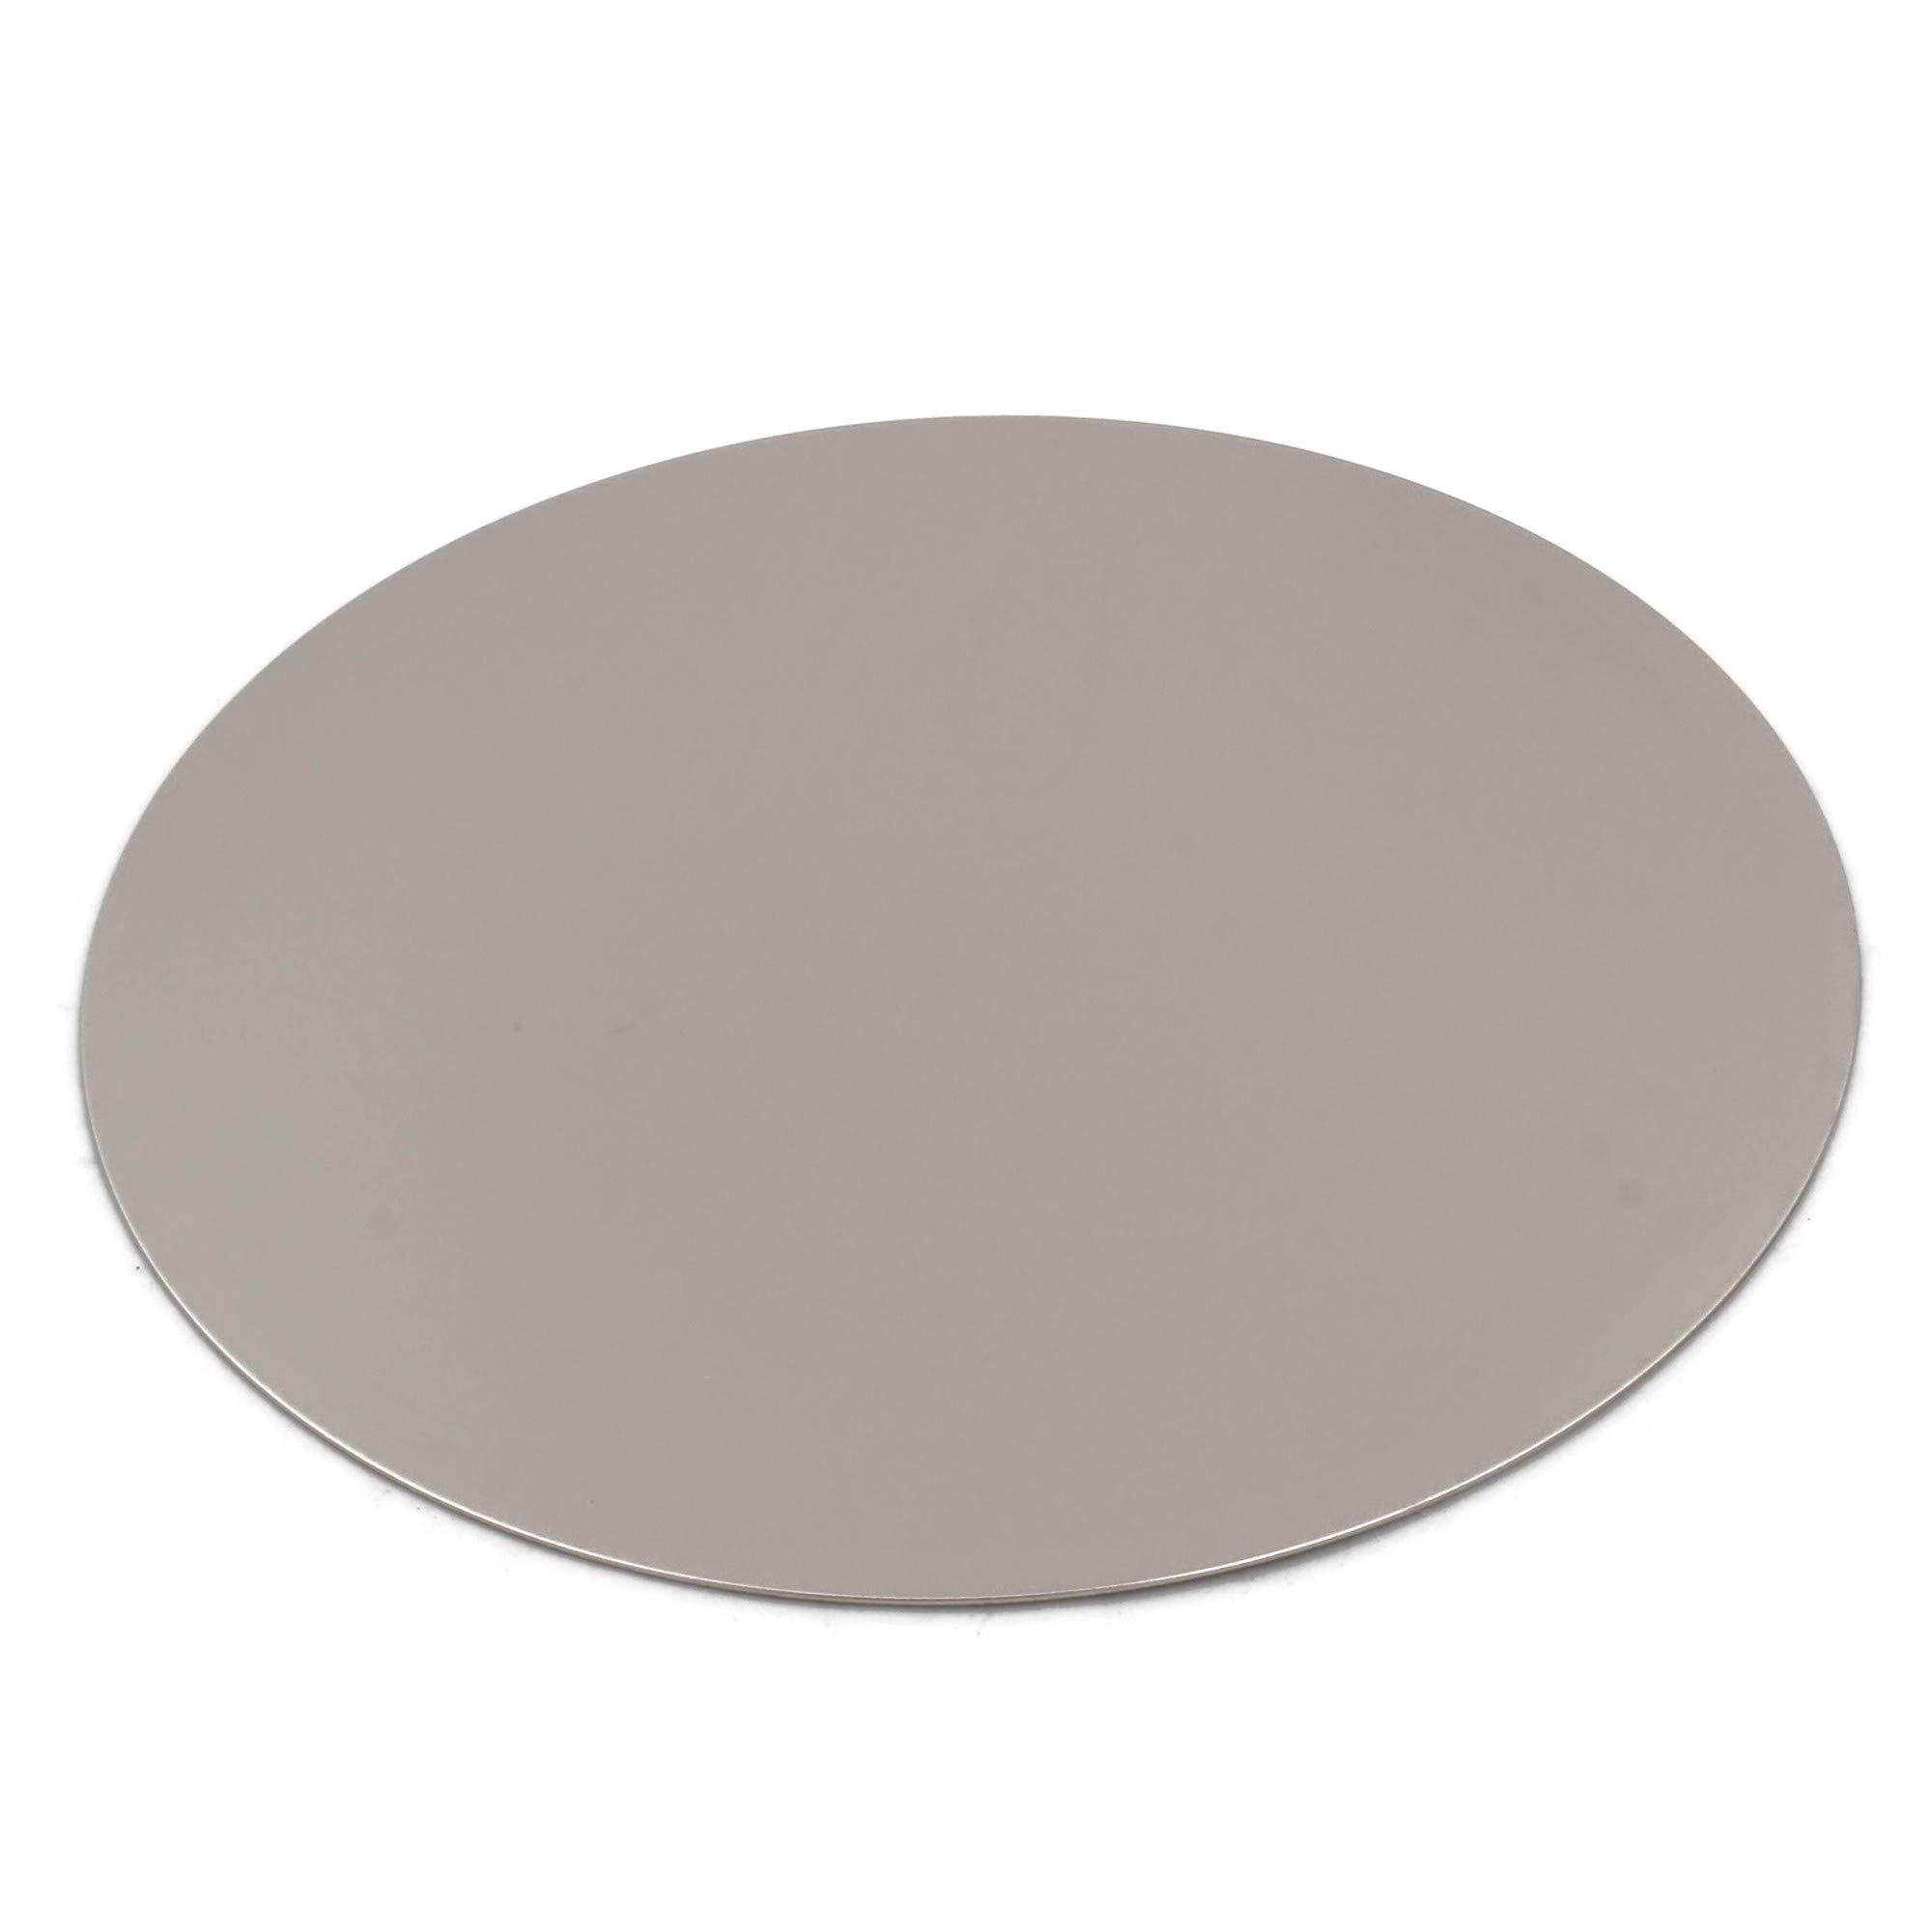 ILOVETOOL 200mm Diamond Discs 3000 Grit Coated No Hole Abrasive Wheel Stone Tools